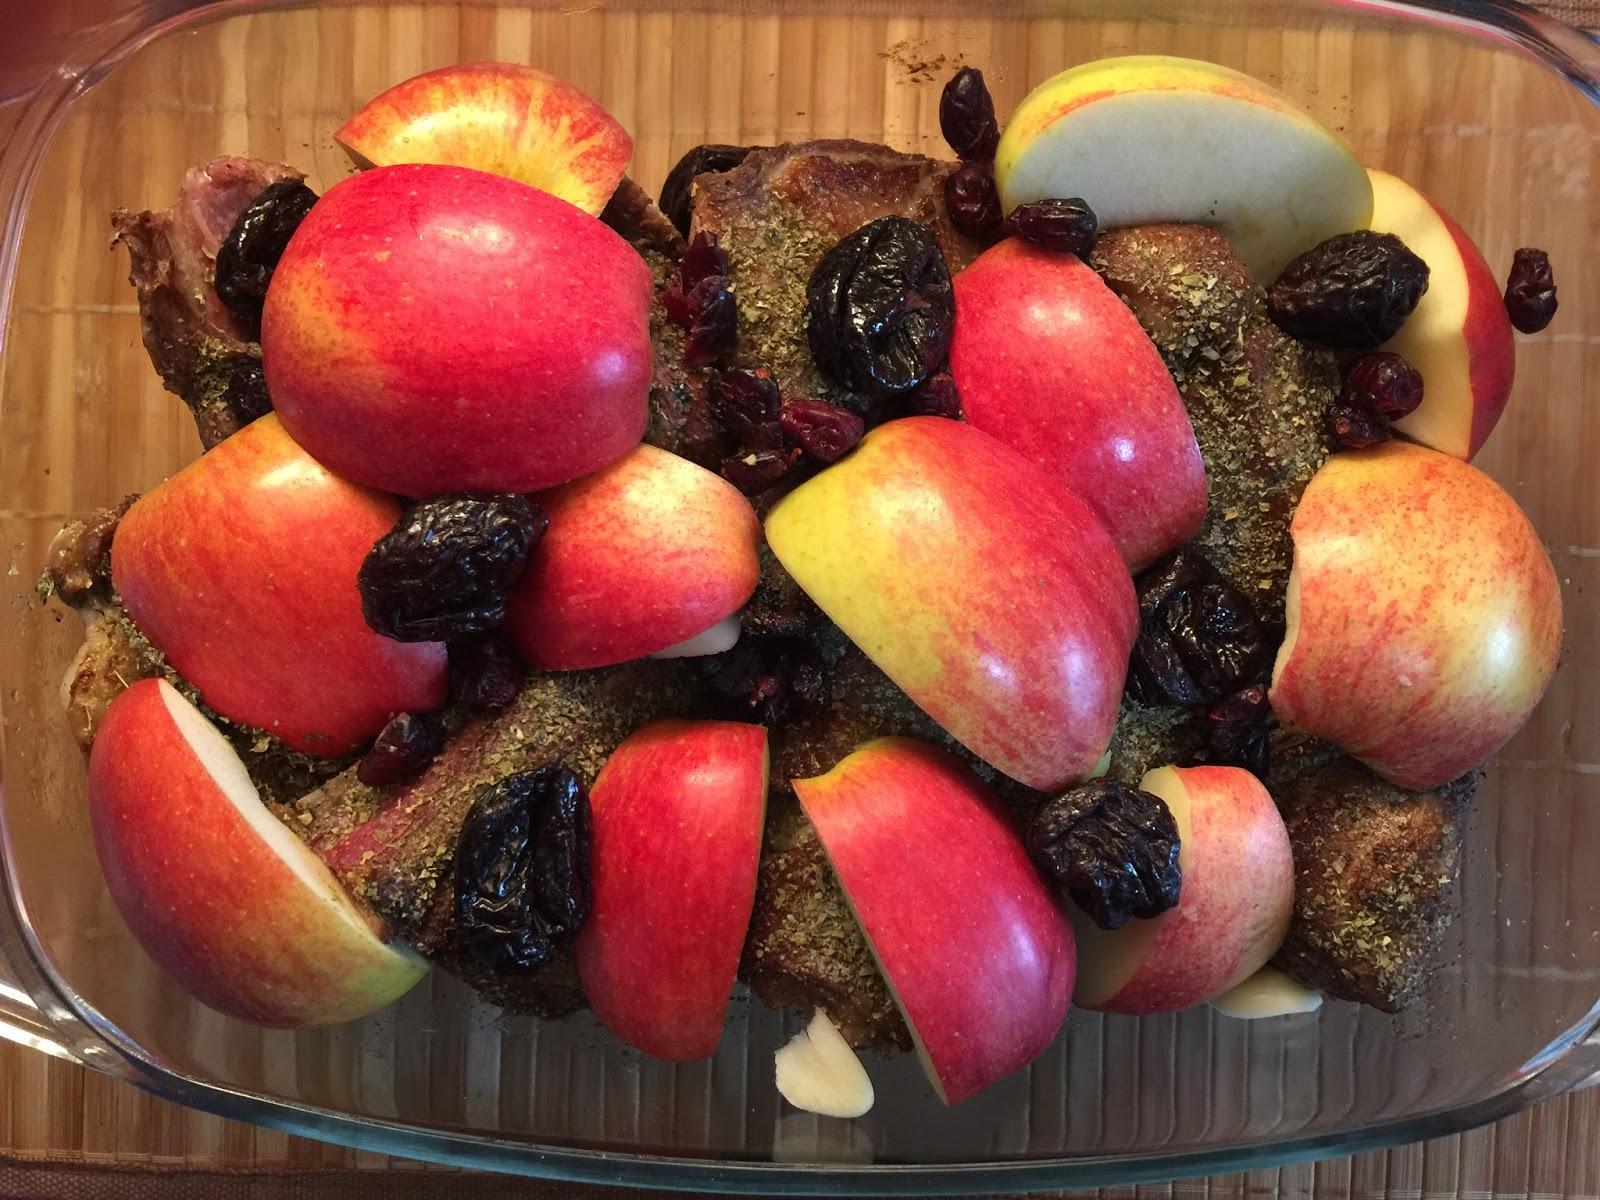 añadimos fruta